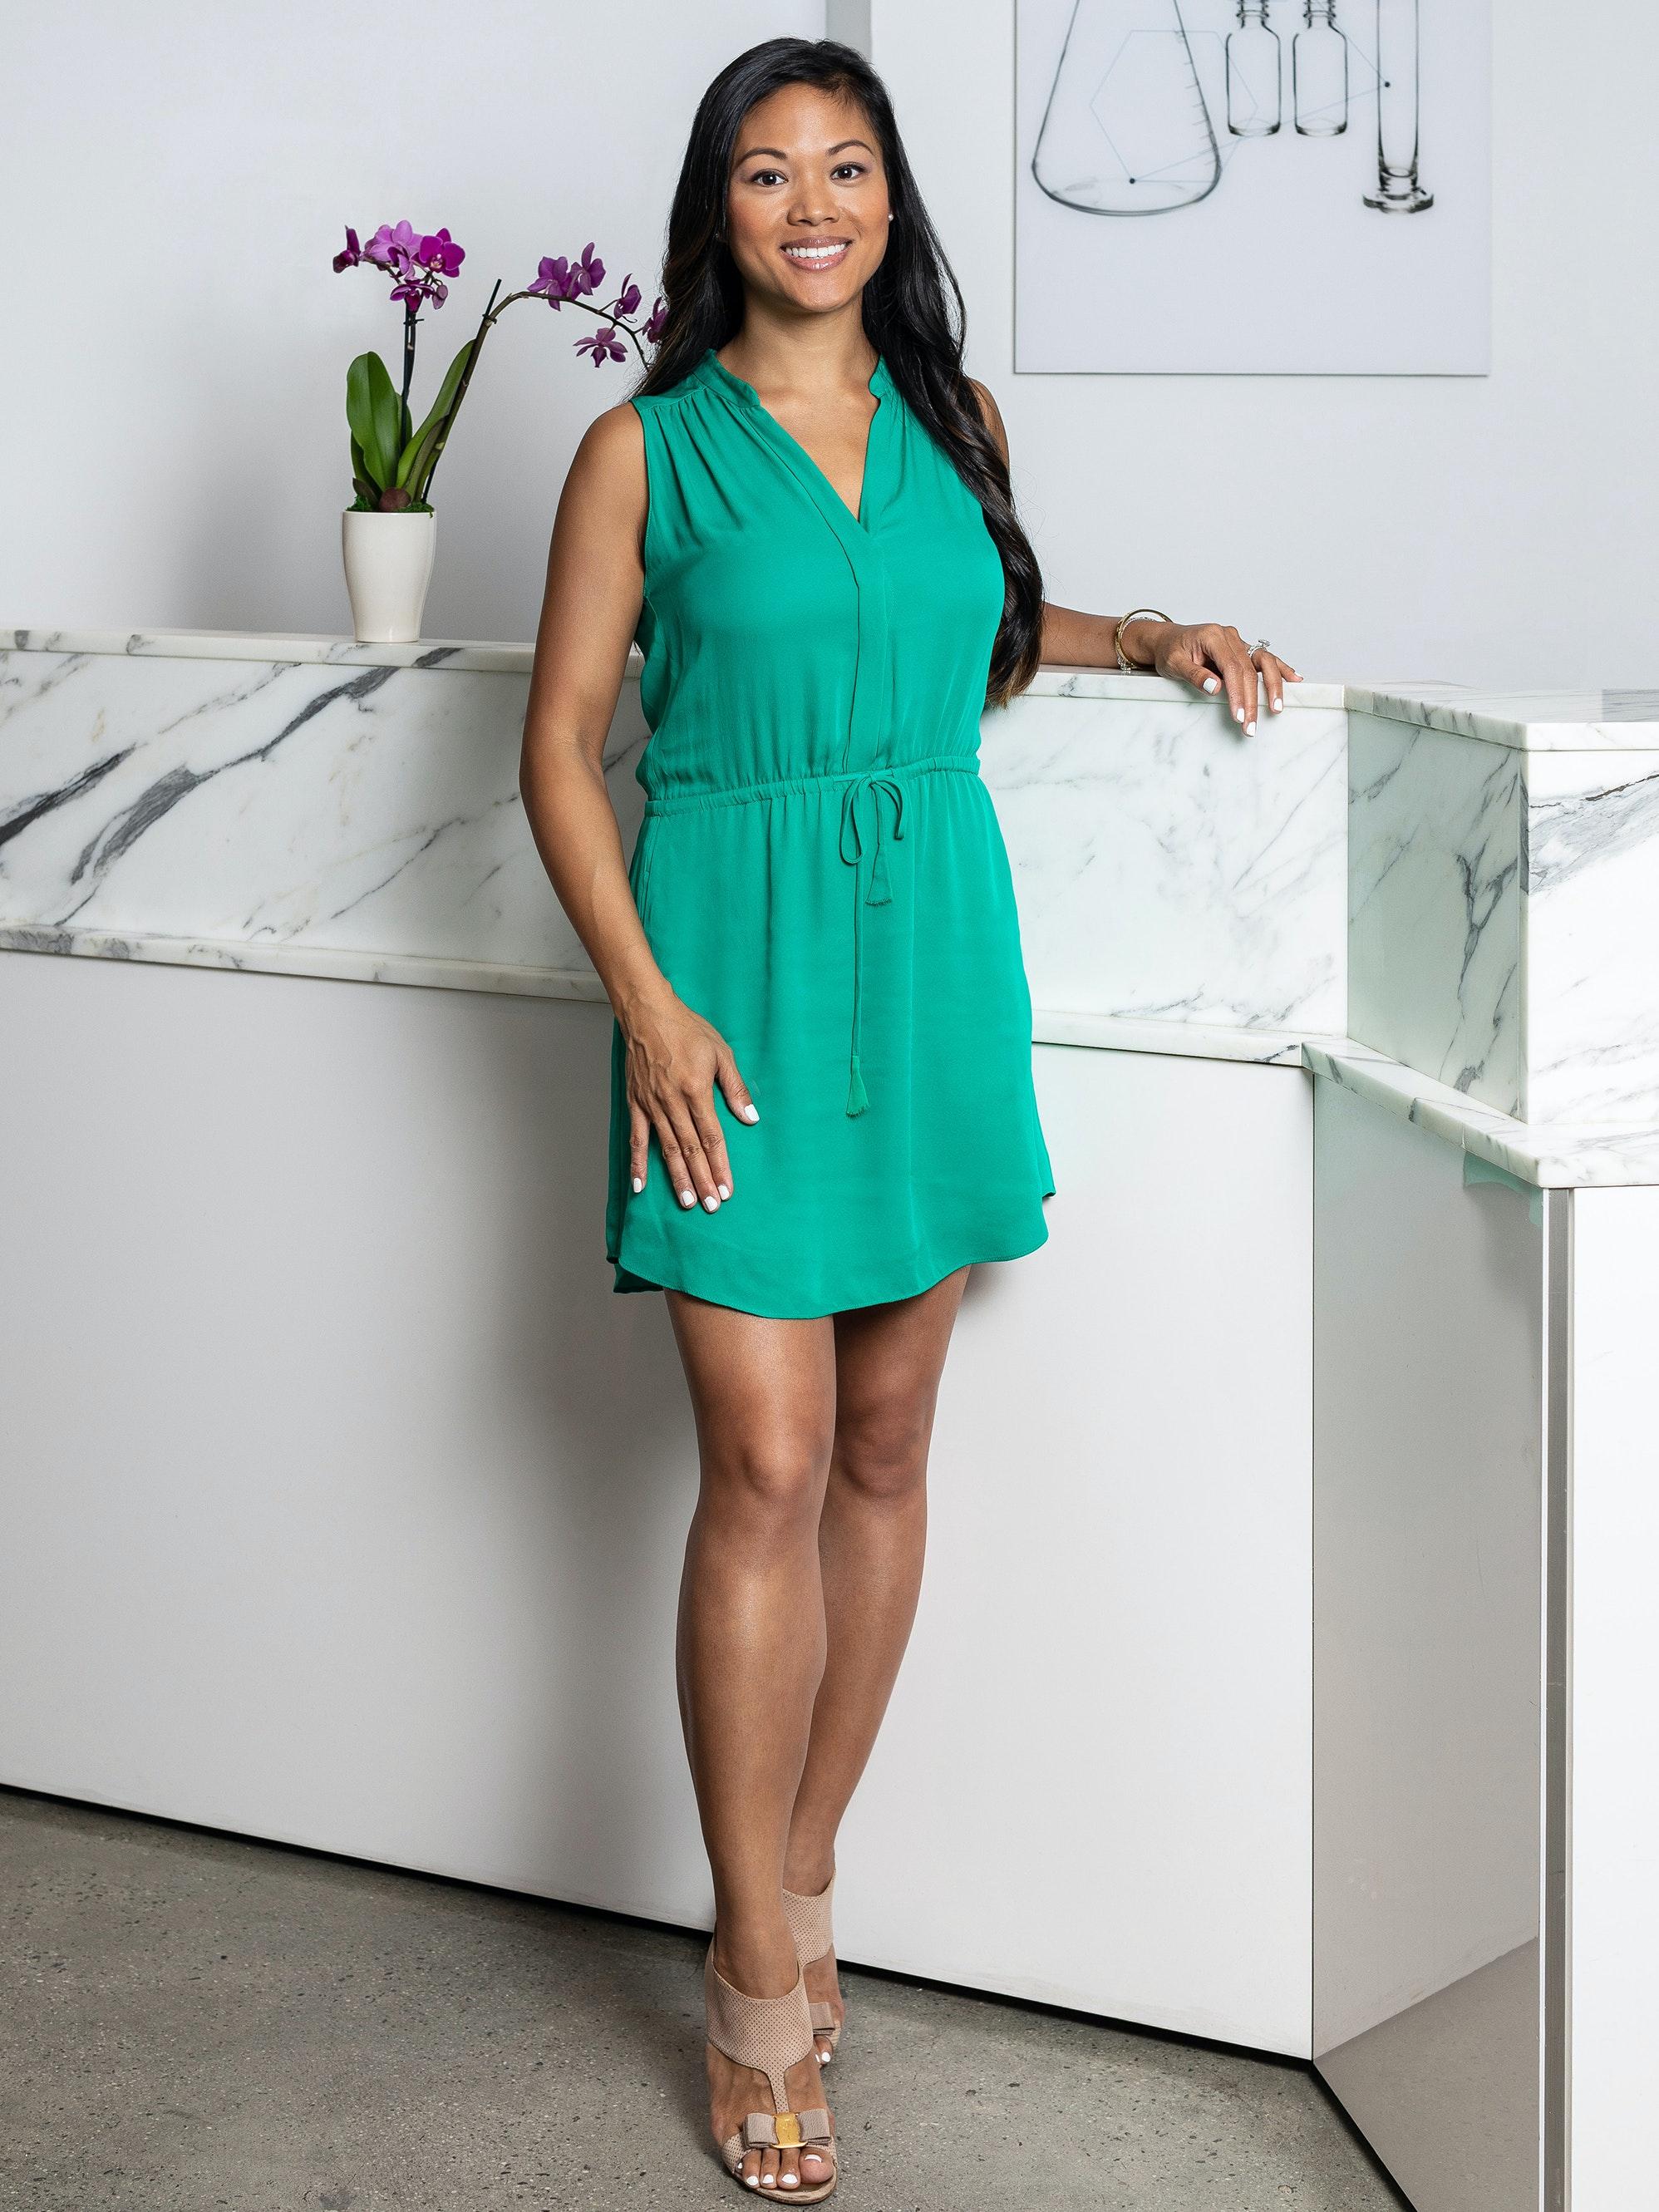 Dr. Tiffany Jow Libby